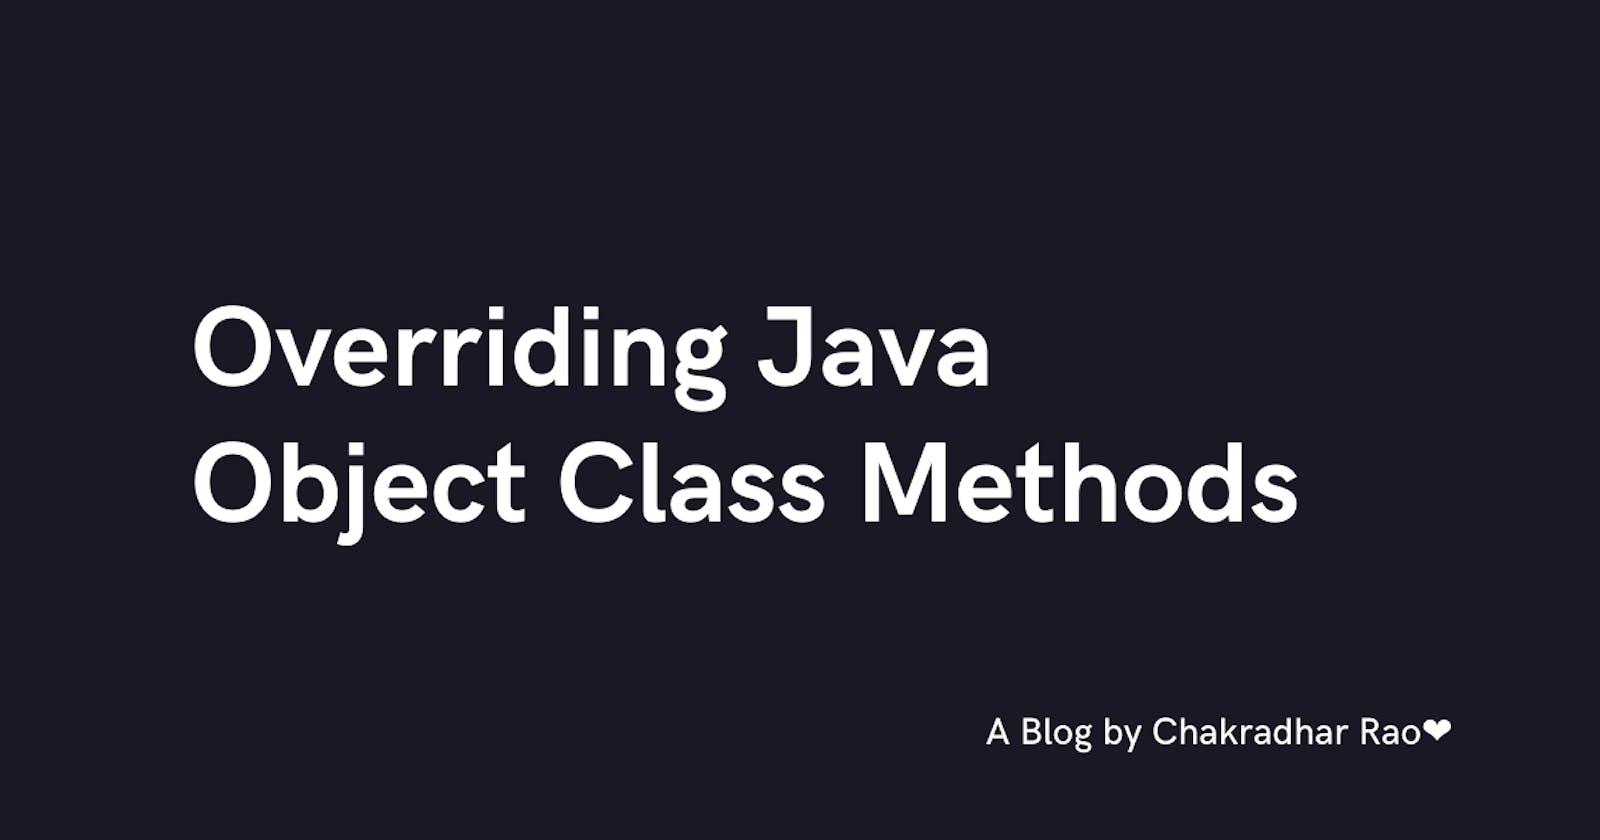 Overriding Java Object Class Methods